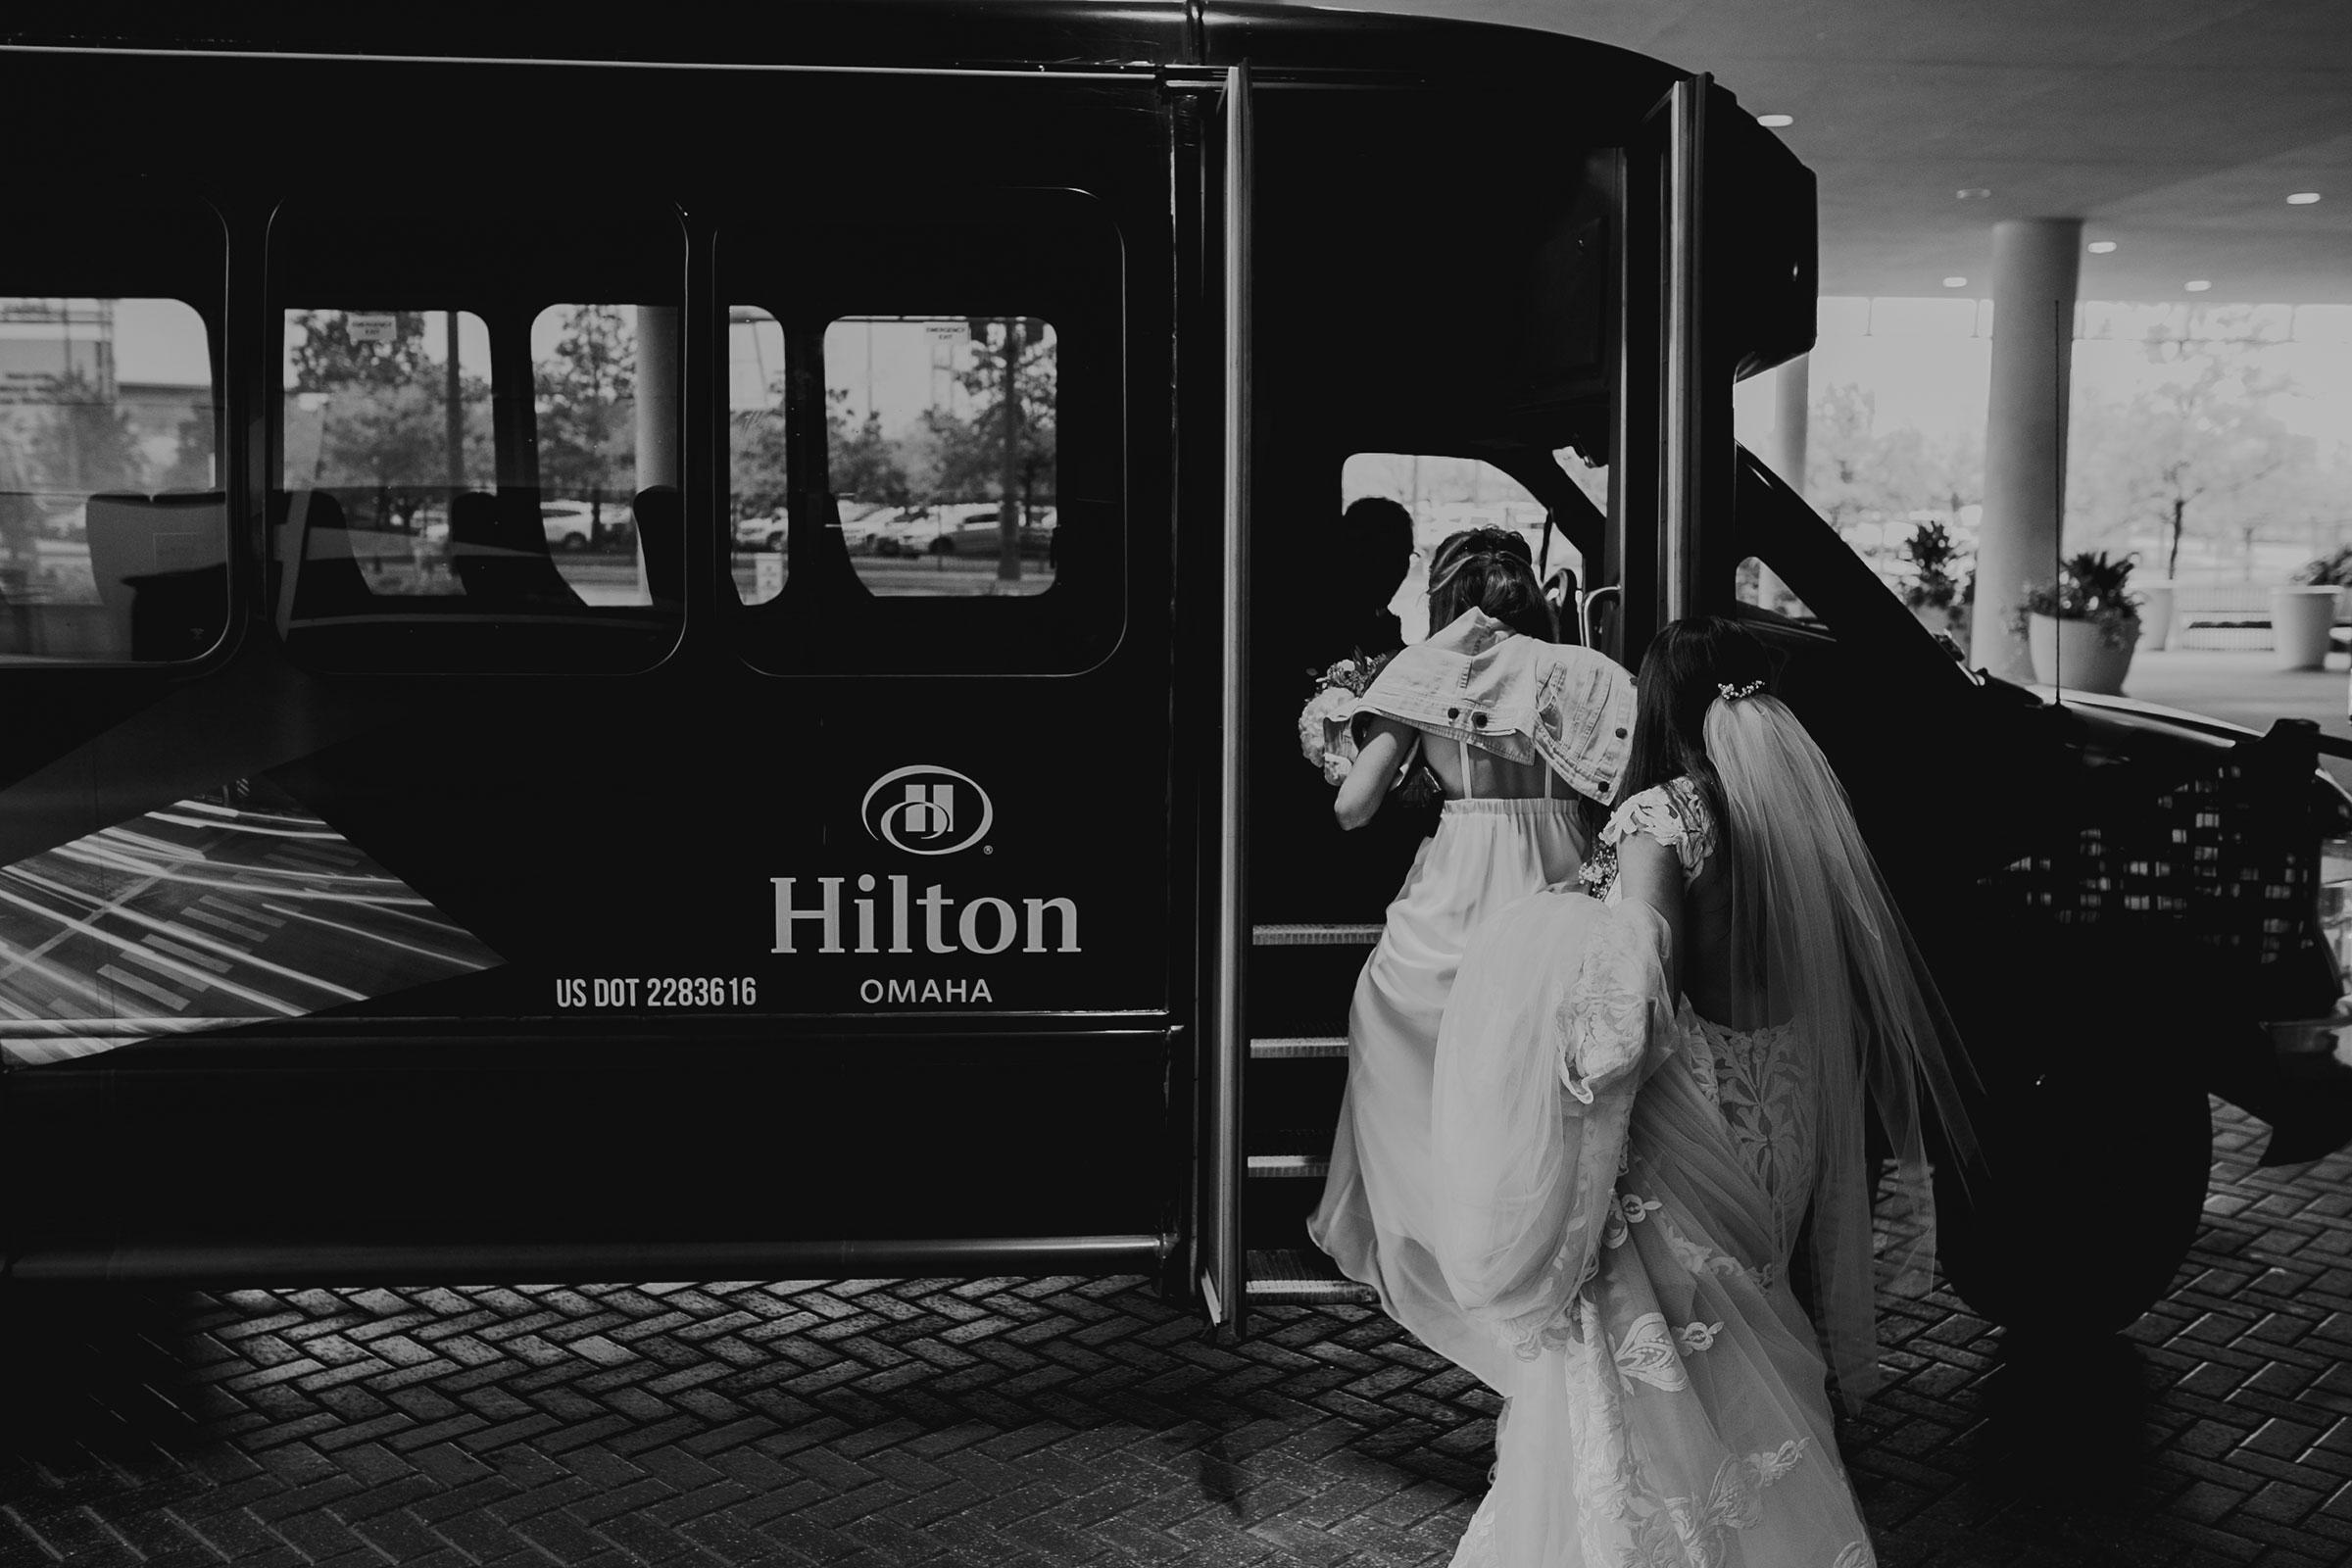 bridal-party-getting-on-shuttle-hilton-omaha-nebraska-raelyn-ramey-photography.jpg